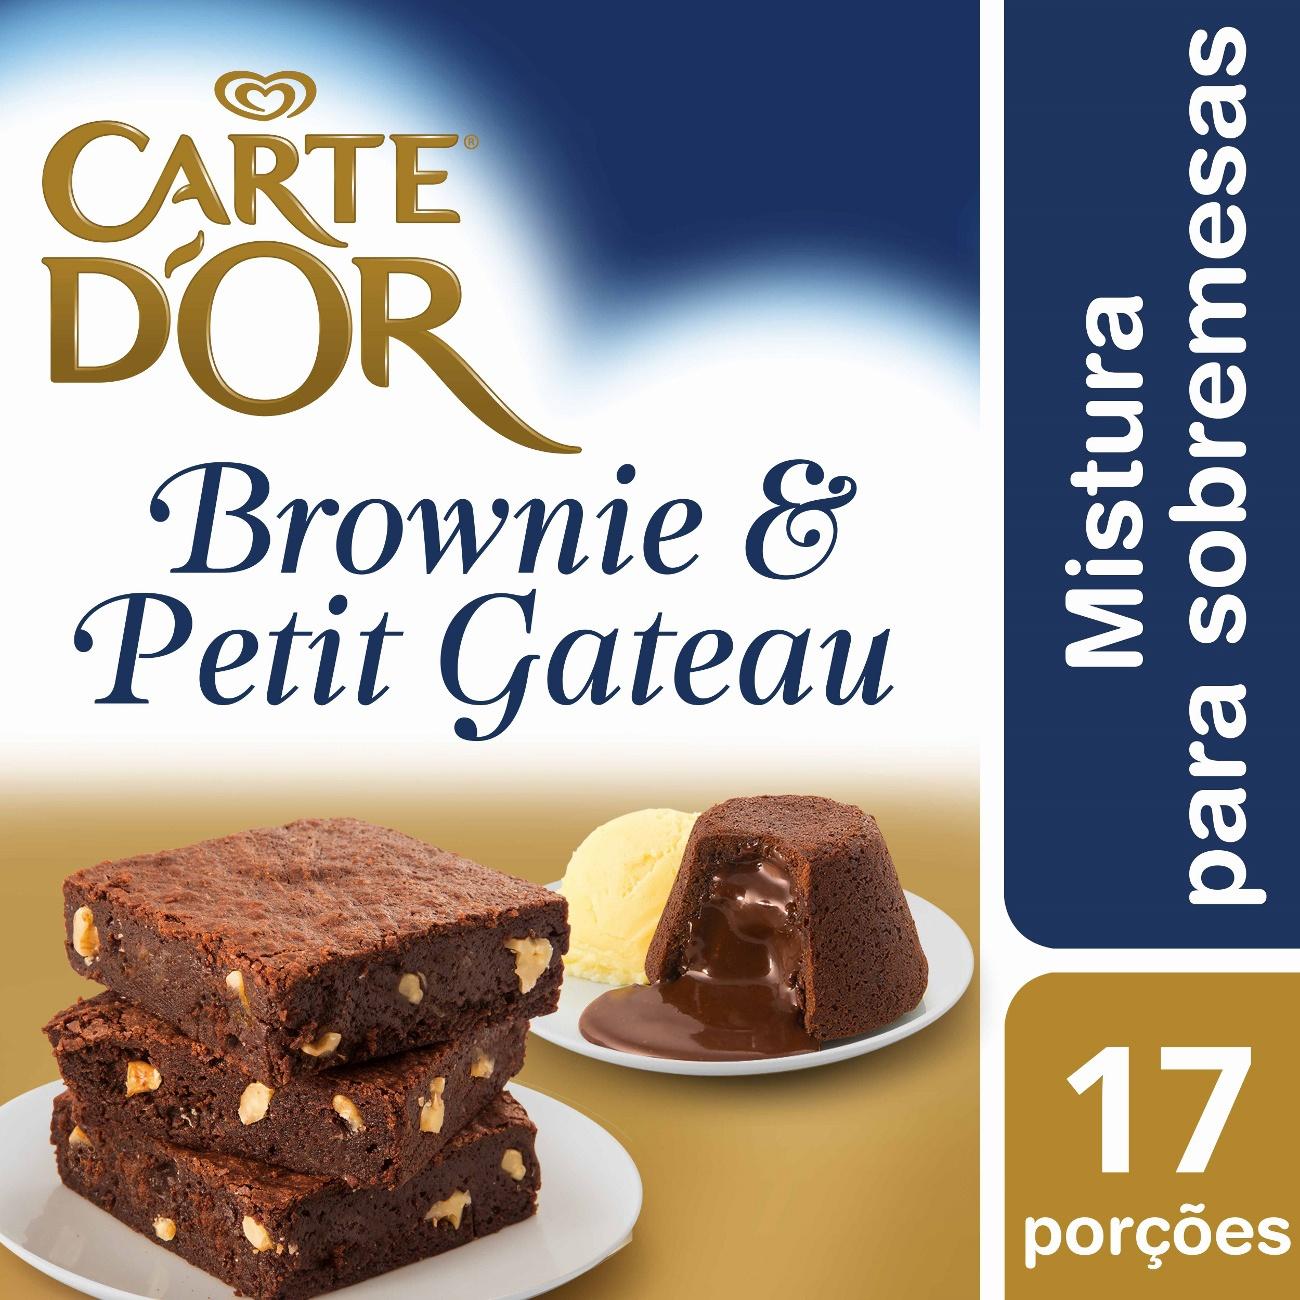 Brownie e Petit Gateau Carte D'Or 800g